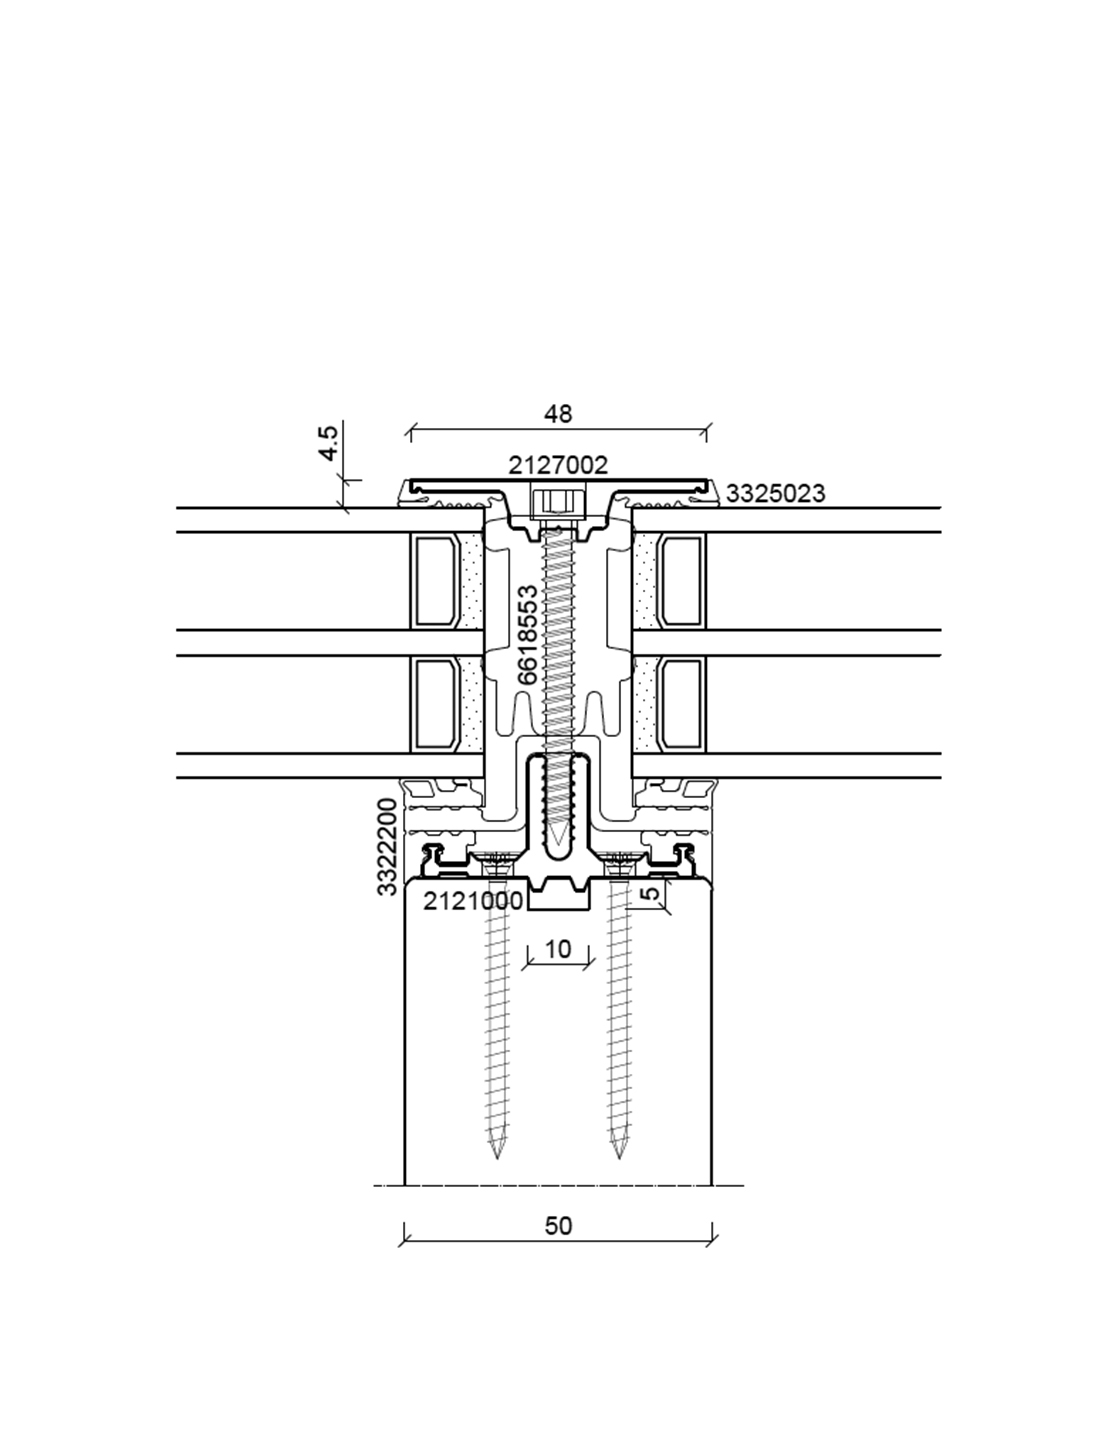 batimet mur rideau bois aluminium tm50 se sg. Black Bedroom Furniture Sets. Home Design Ideas